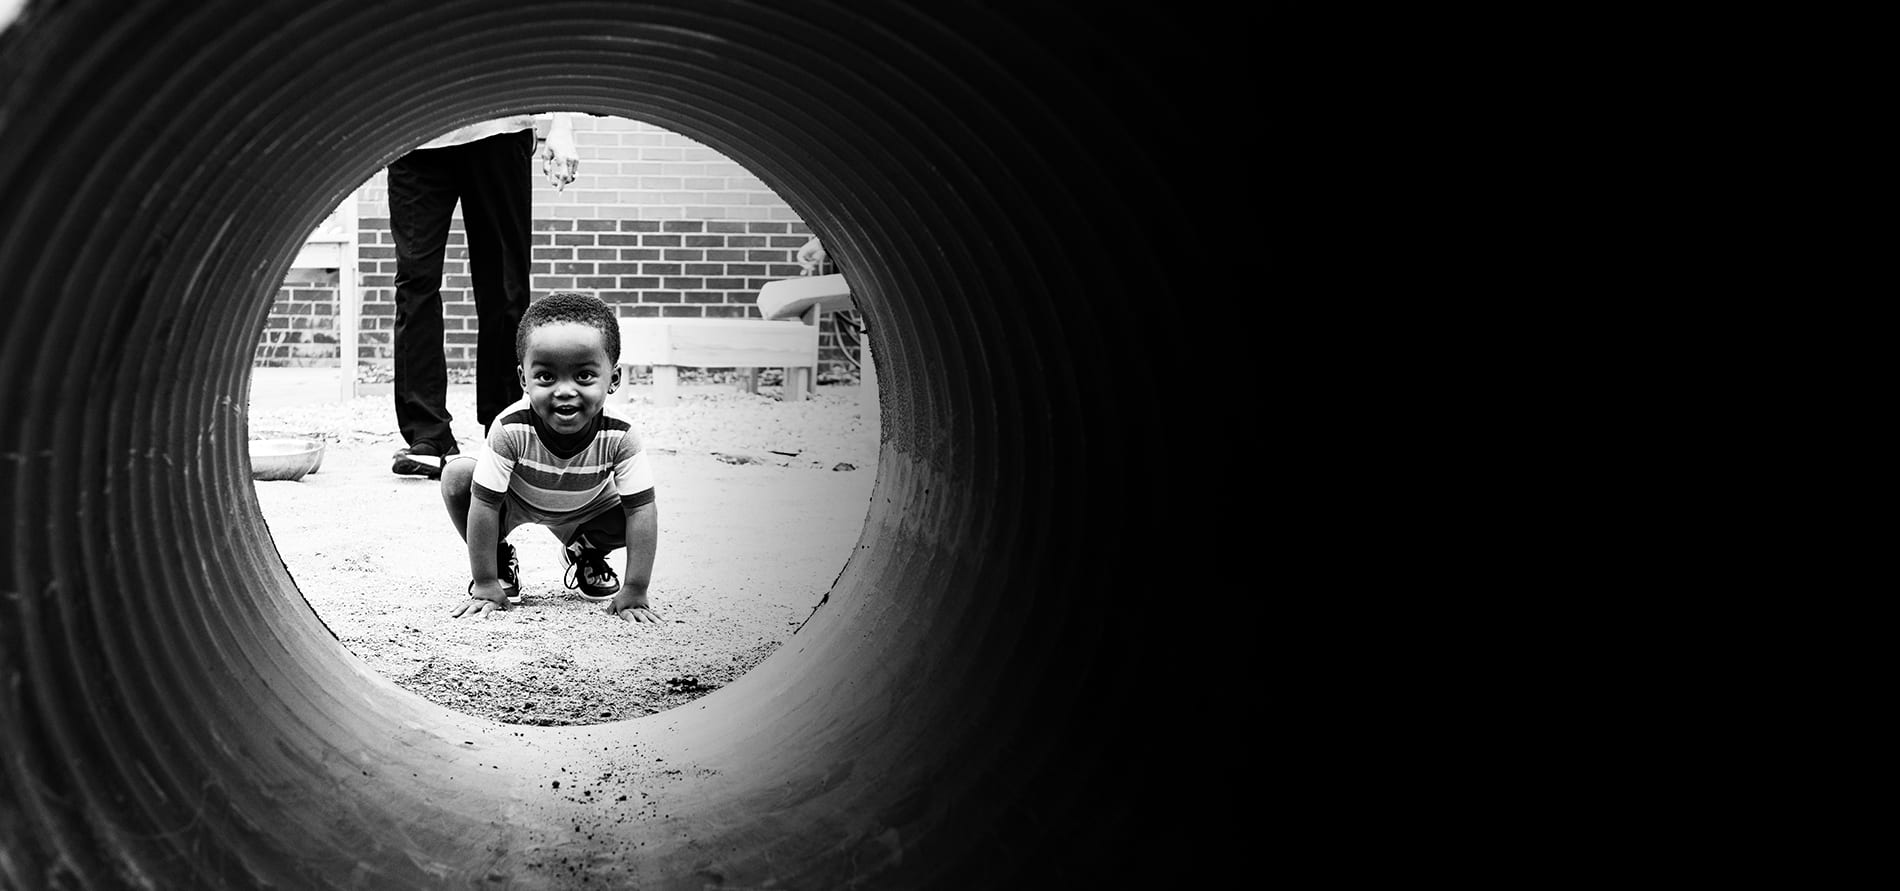 A child peeks through a tunnel